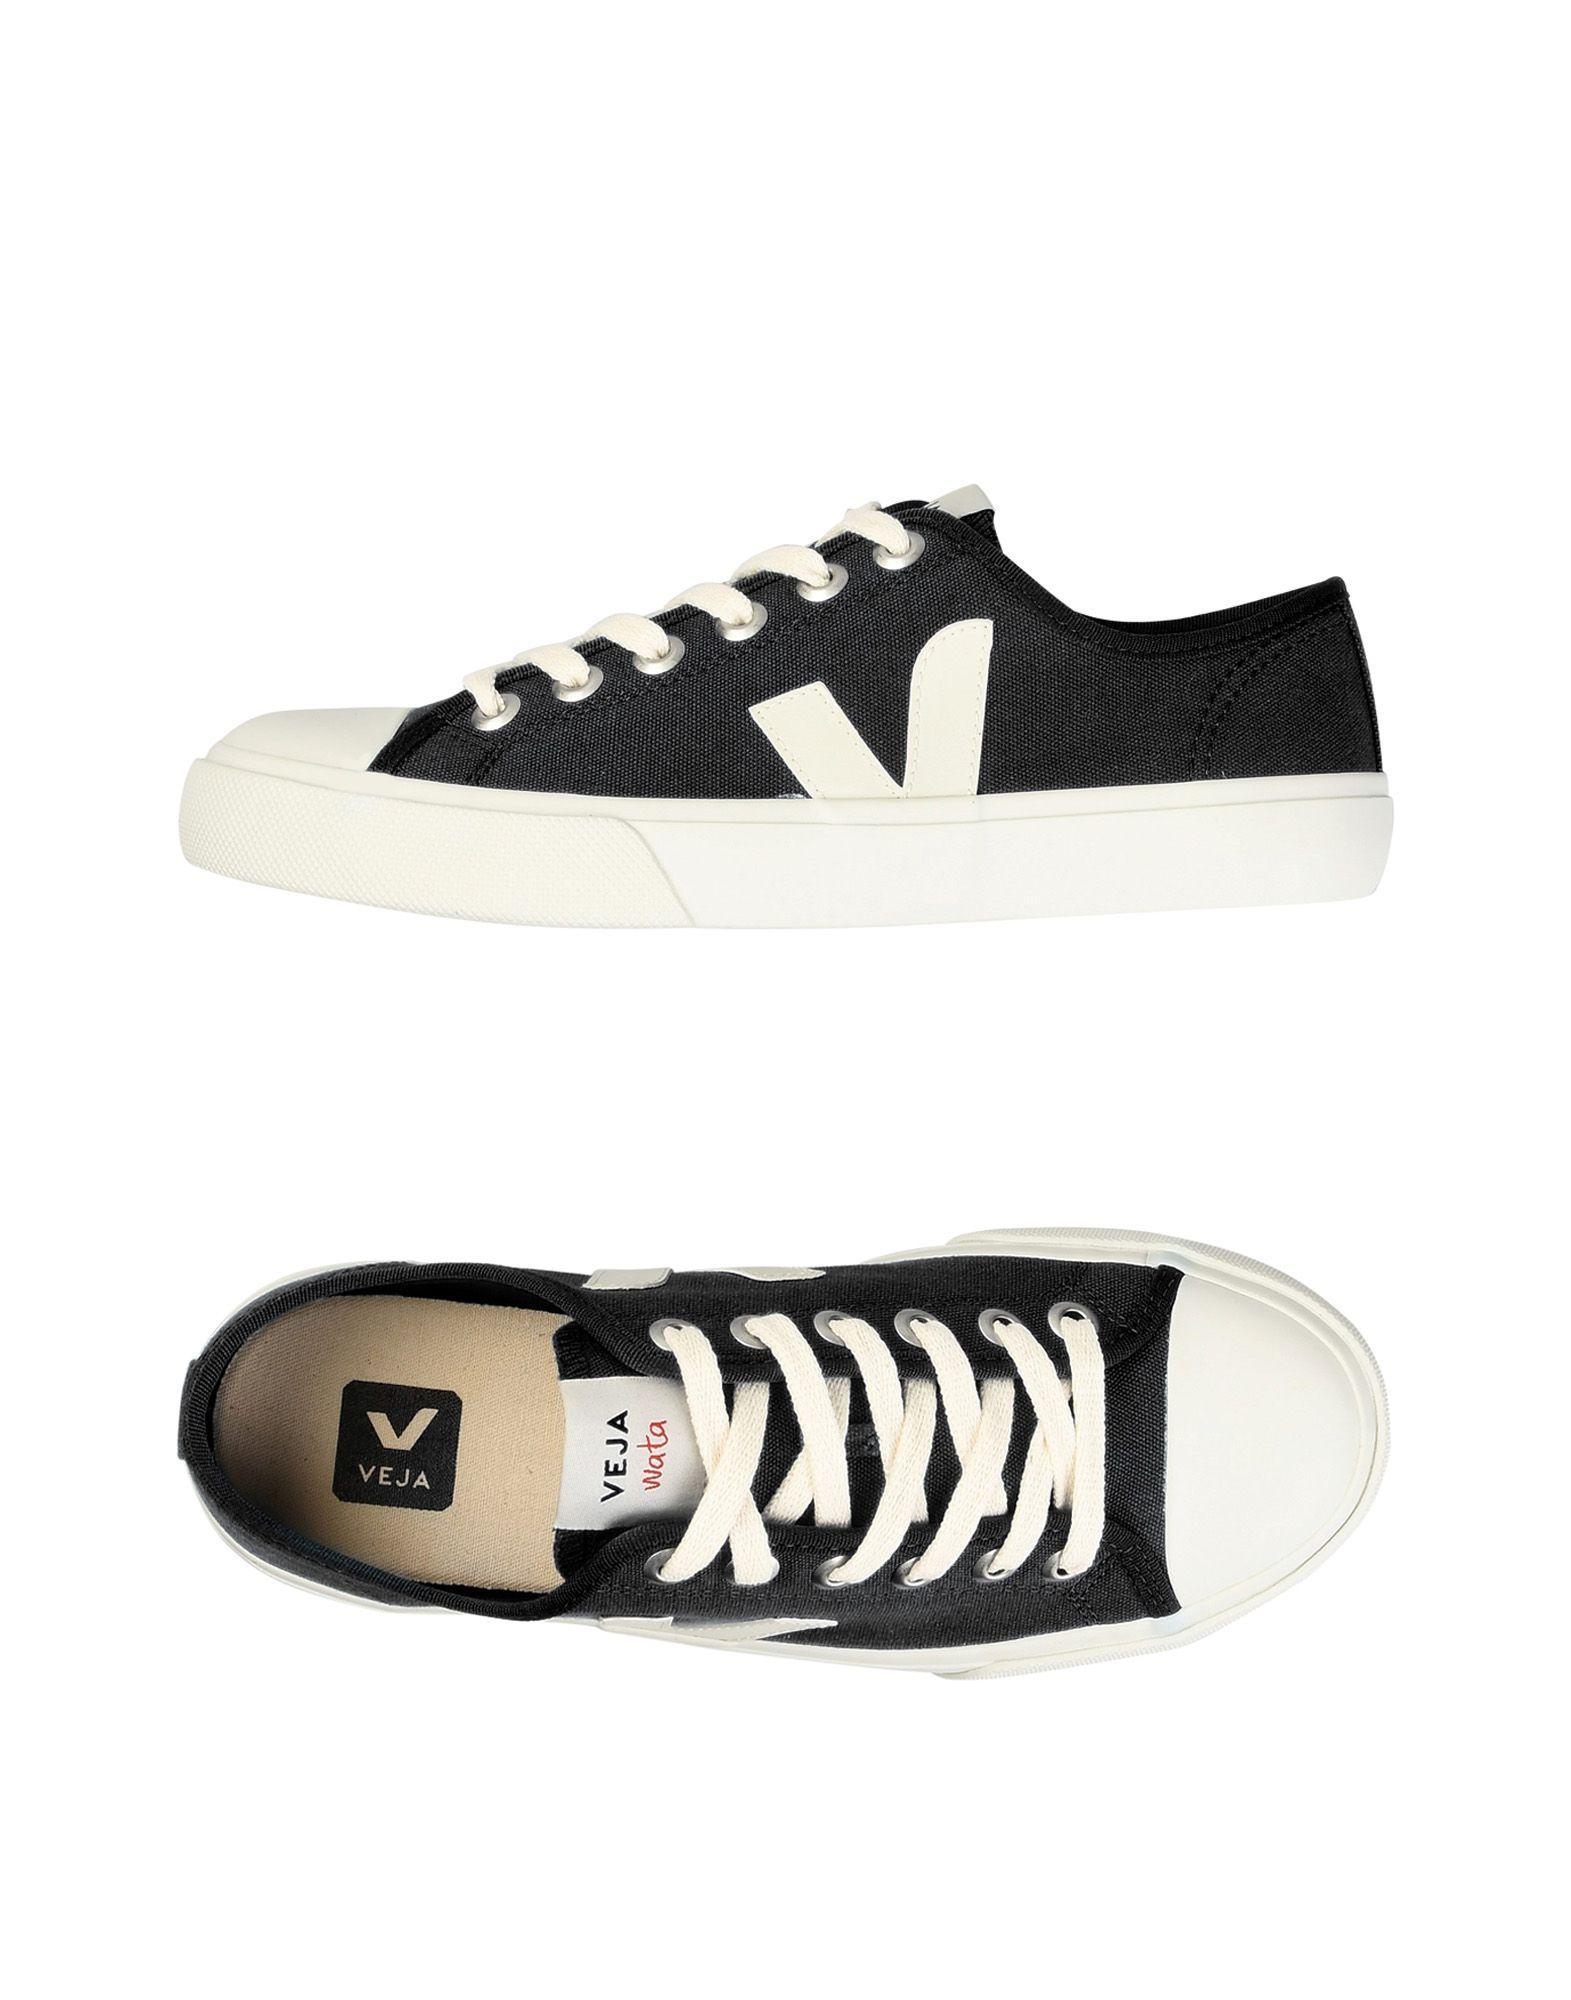 Veja Noca Canvas Sneakers In Black